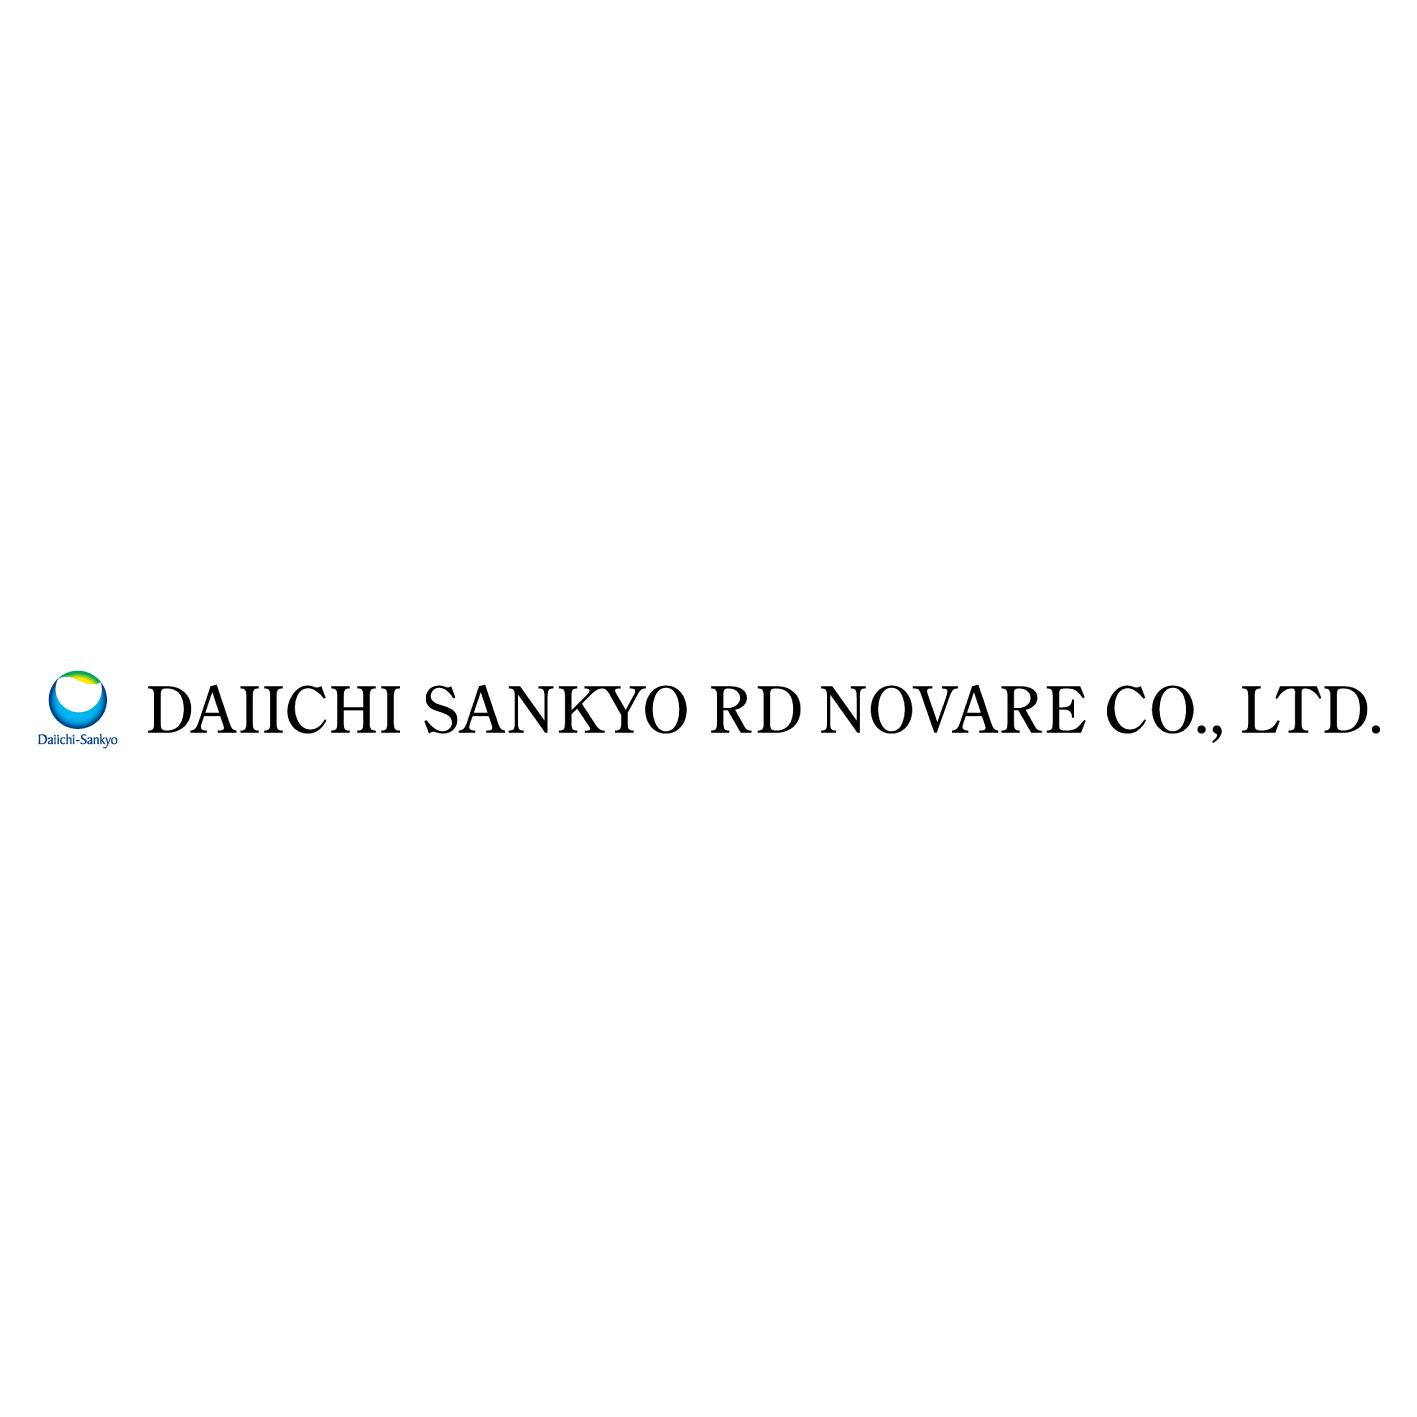 Daiichi Sankyo RD Novare Co., Ltd.